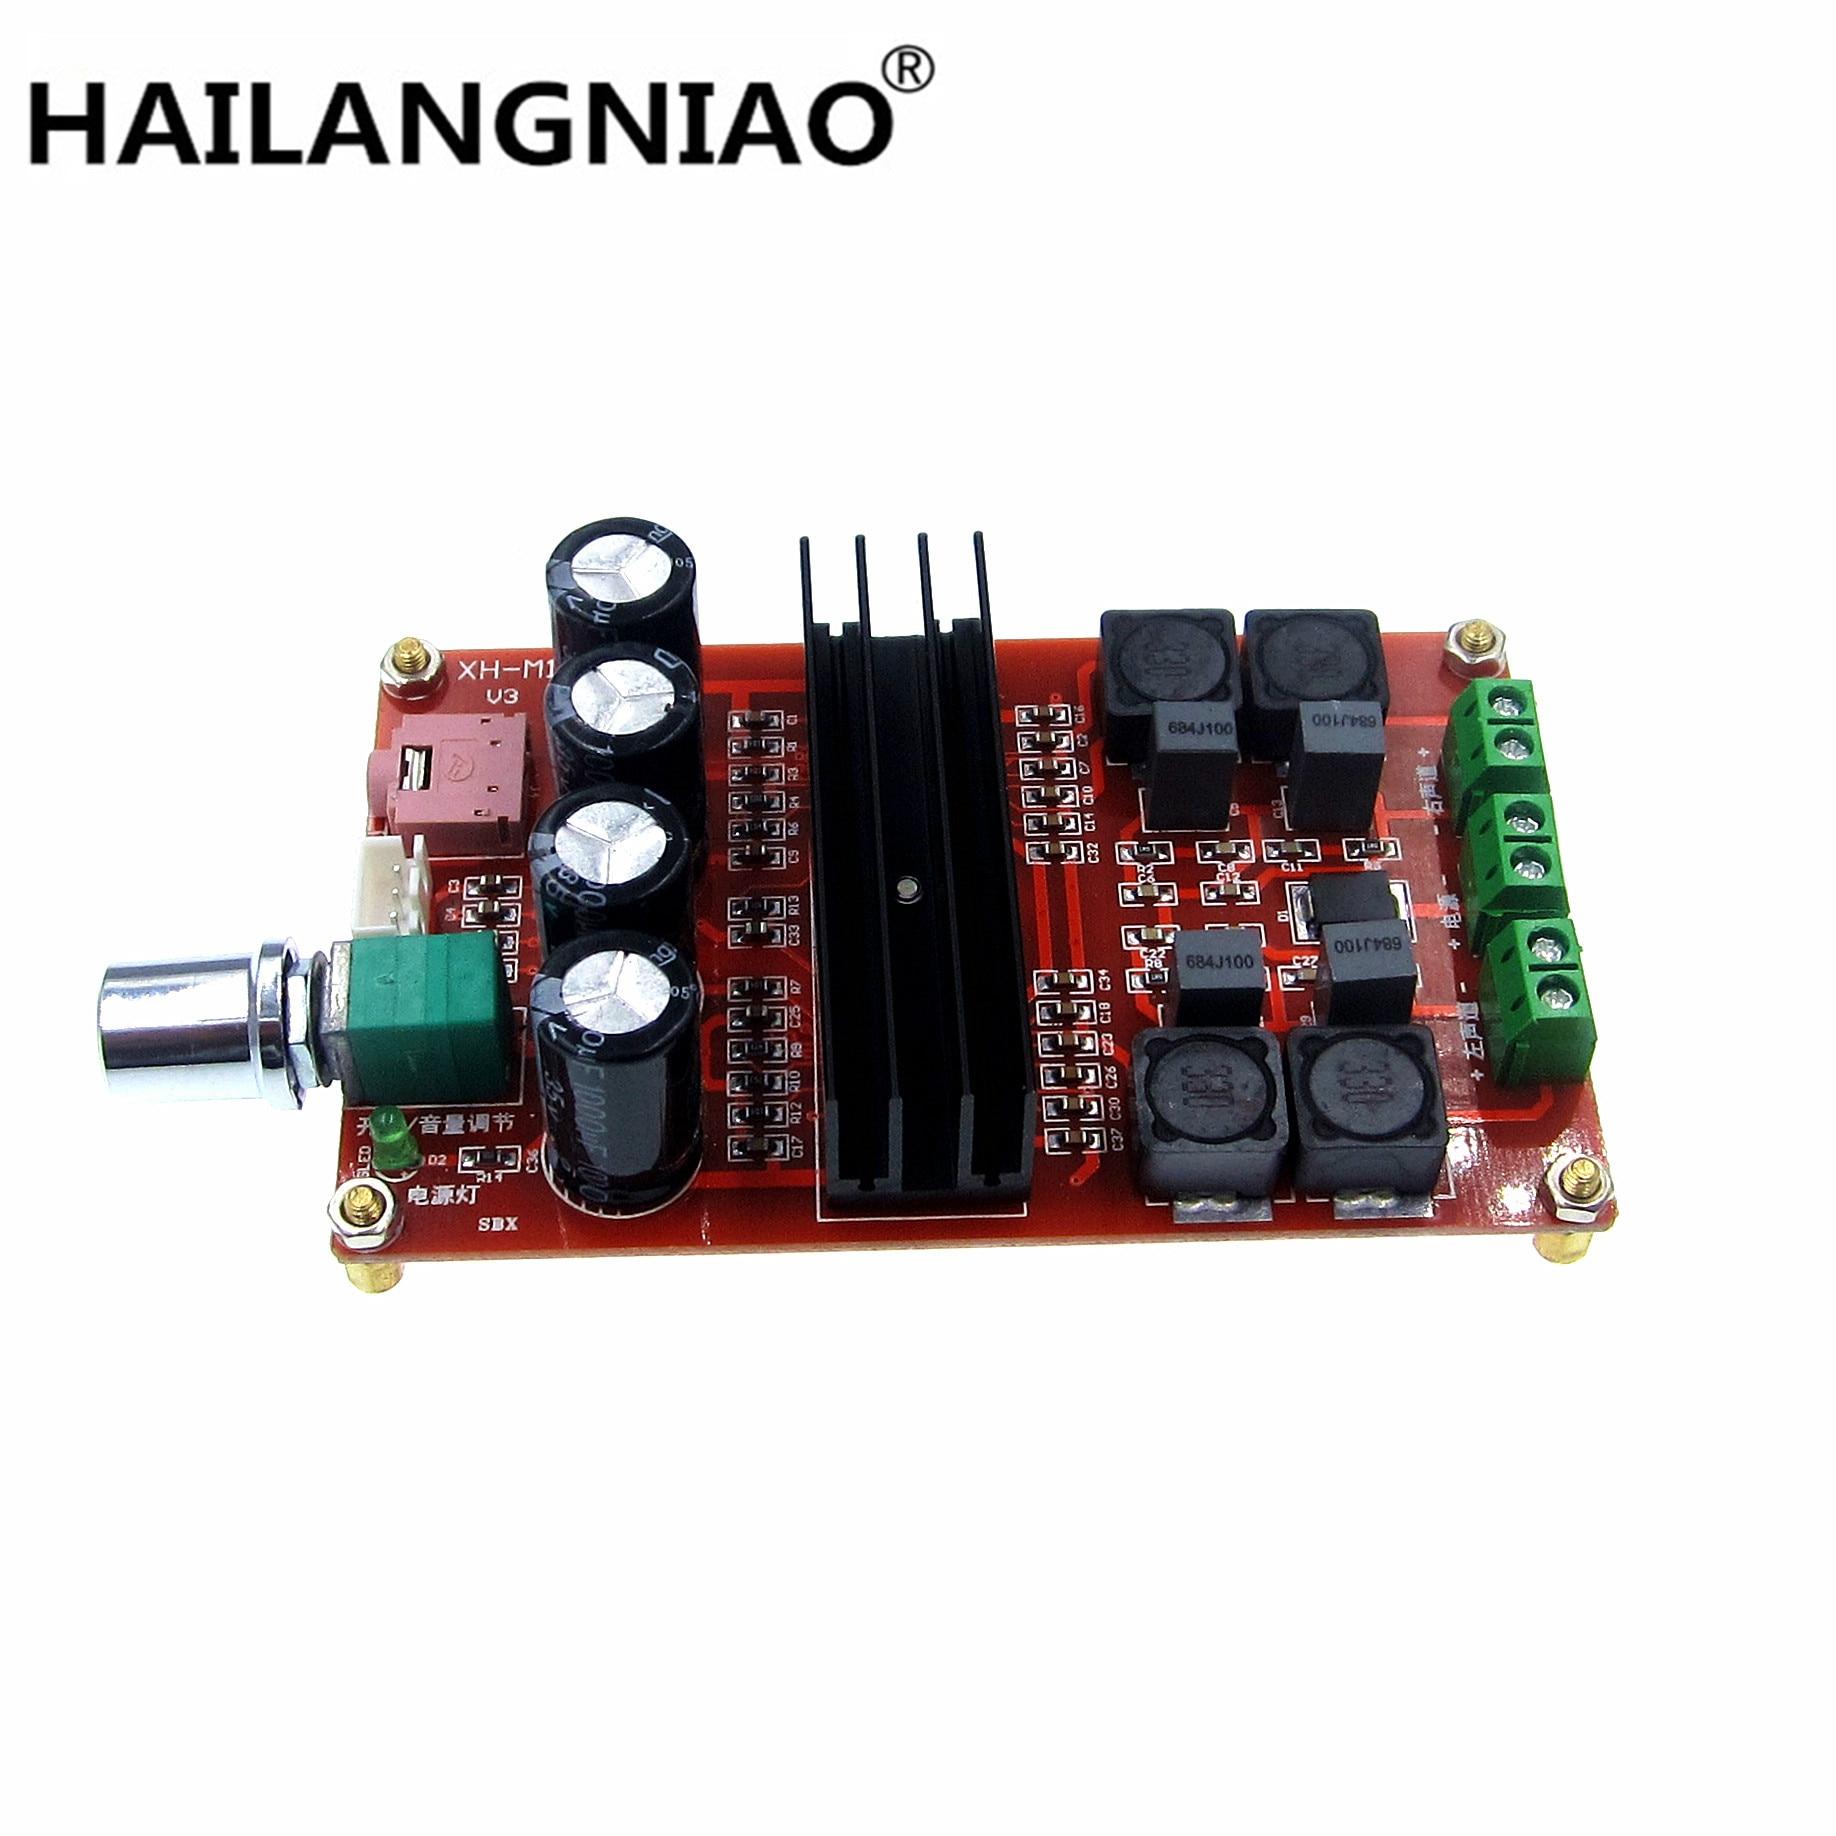 Nuevo tubo de XH-M190 tarjeta de Audio Digital TDA3116D2 potencia Audio Amp 2,0 CLASE D ESTÉREO HIFI amplificador DC12-24V 2*100W